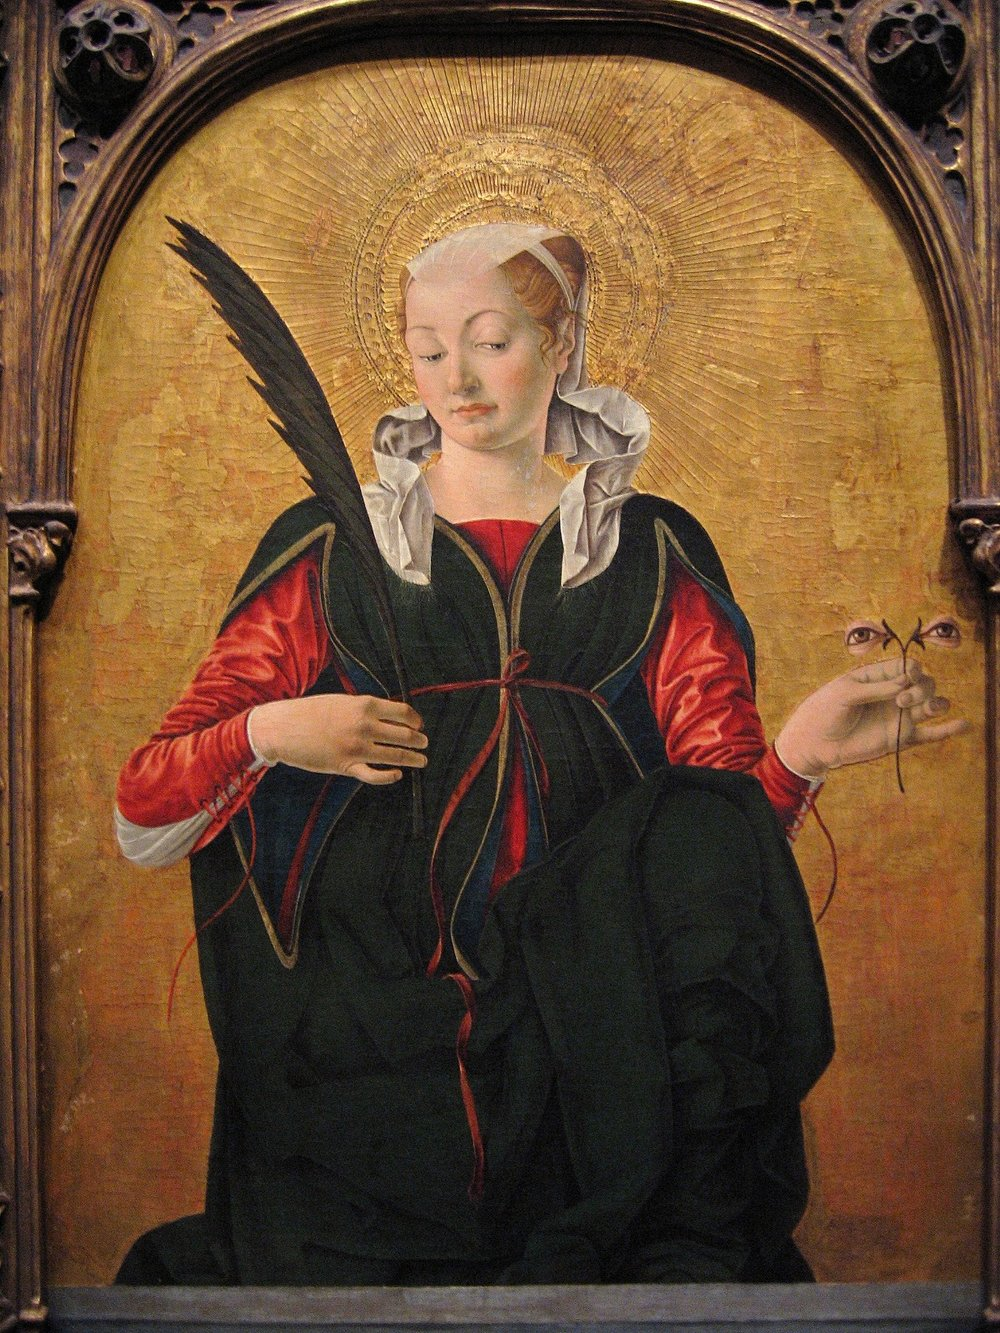 Francesco del Cossa, Santa Lucia, 1472-1743, National Gallery of Art, Washington